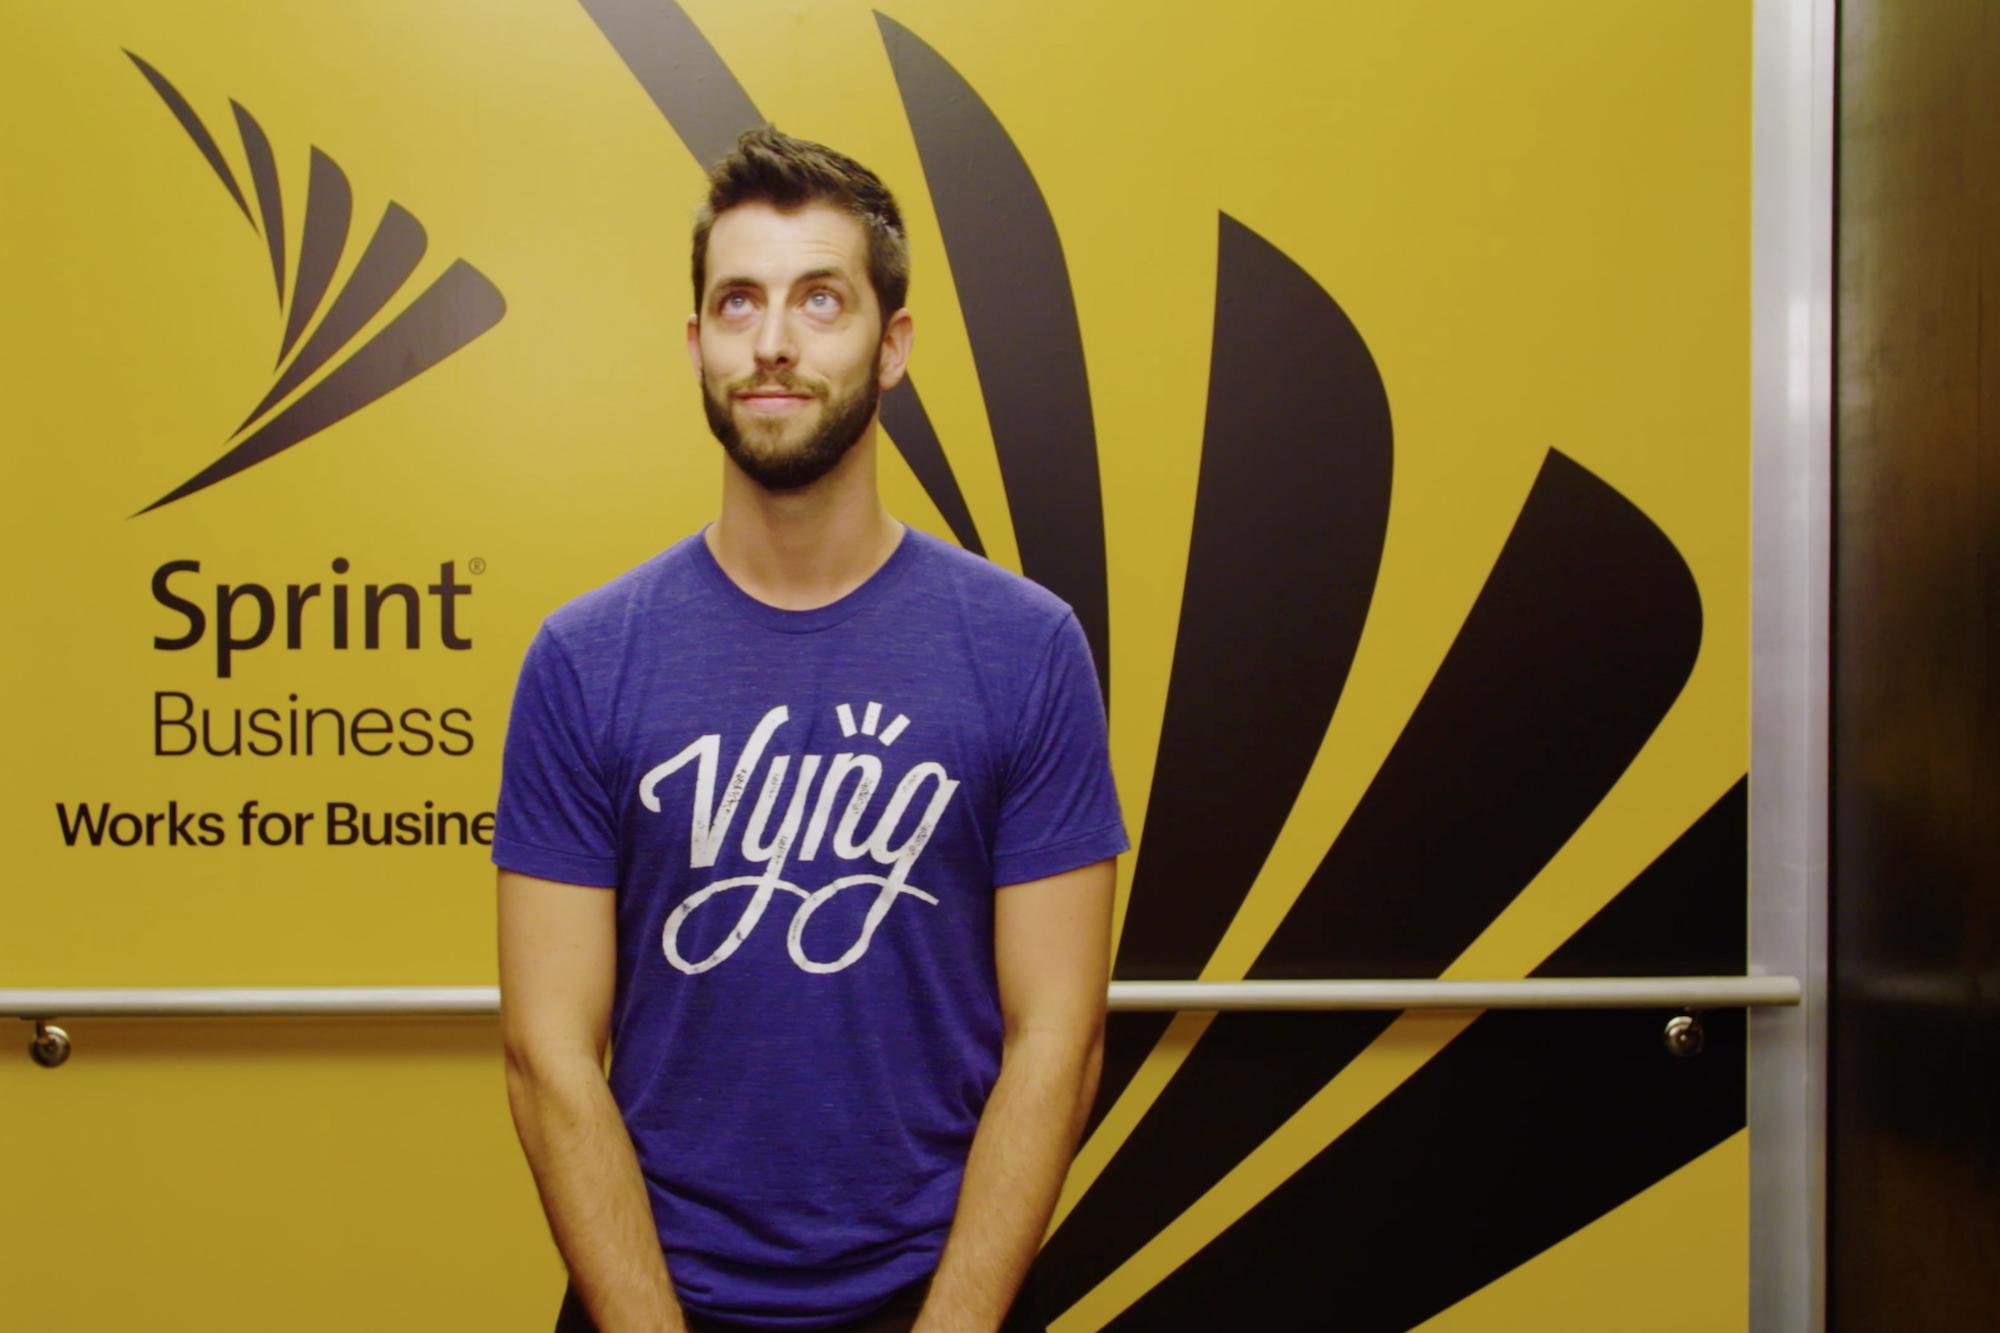 Entrepreneur Elevator Pitch Season 3 Episode 5: 'I Accept Your Offer of My Offer'